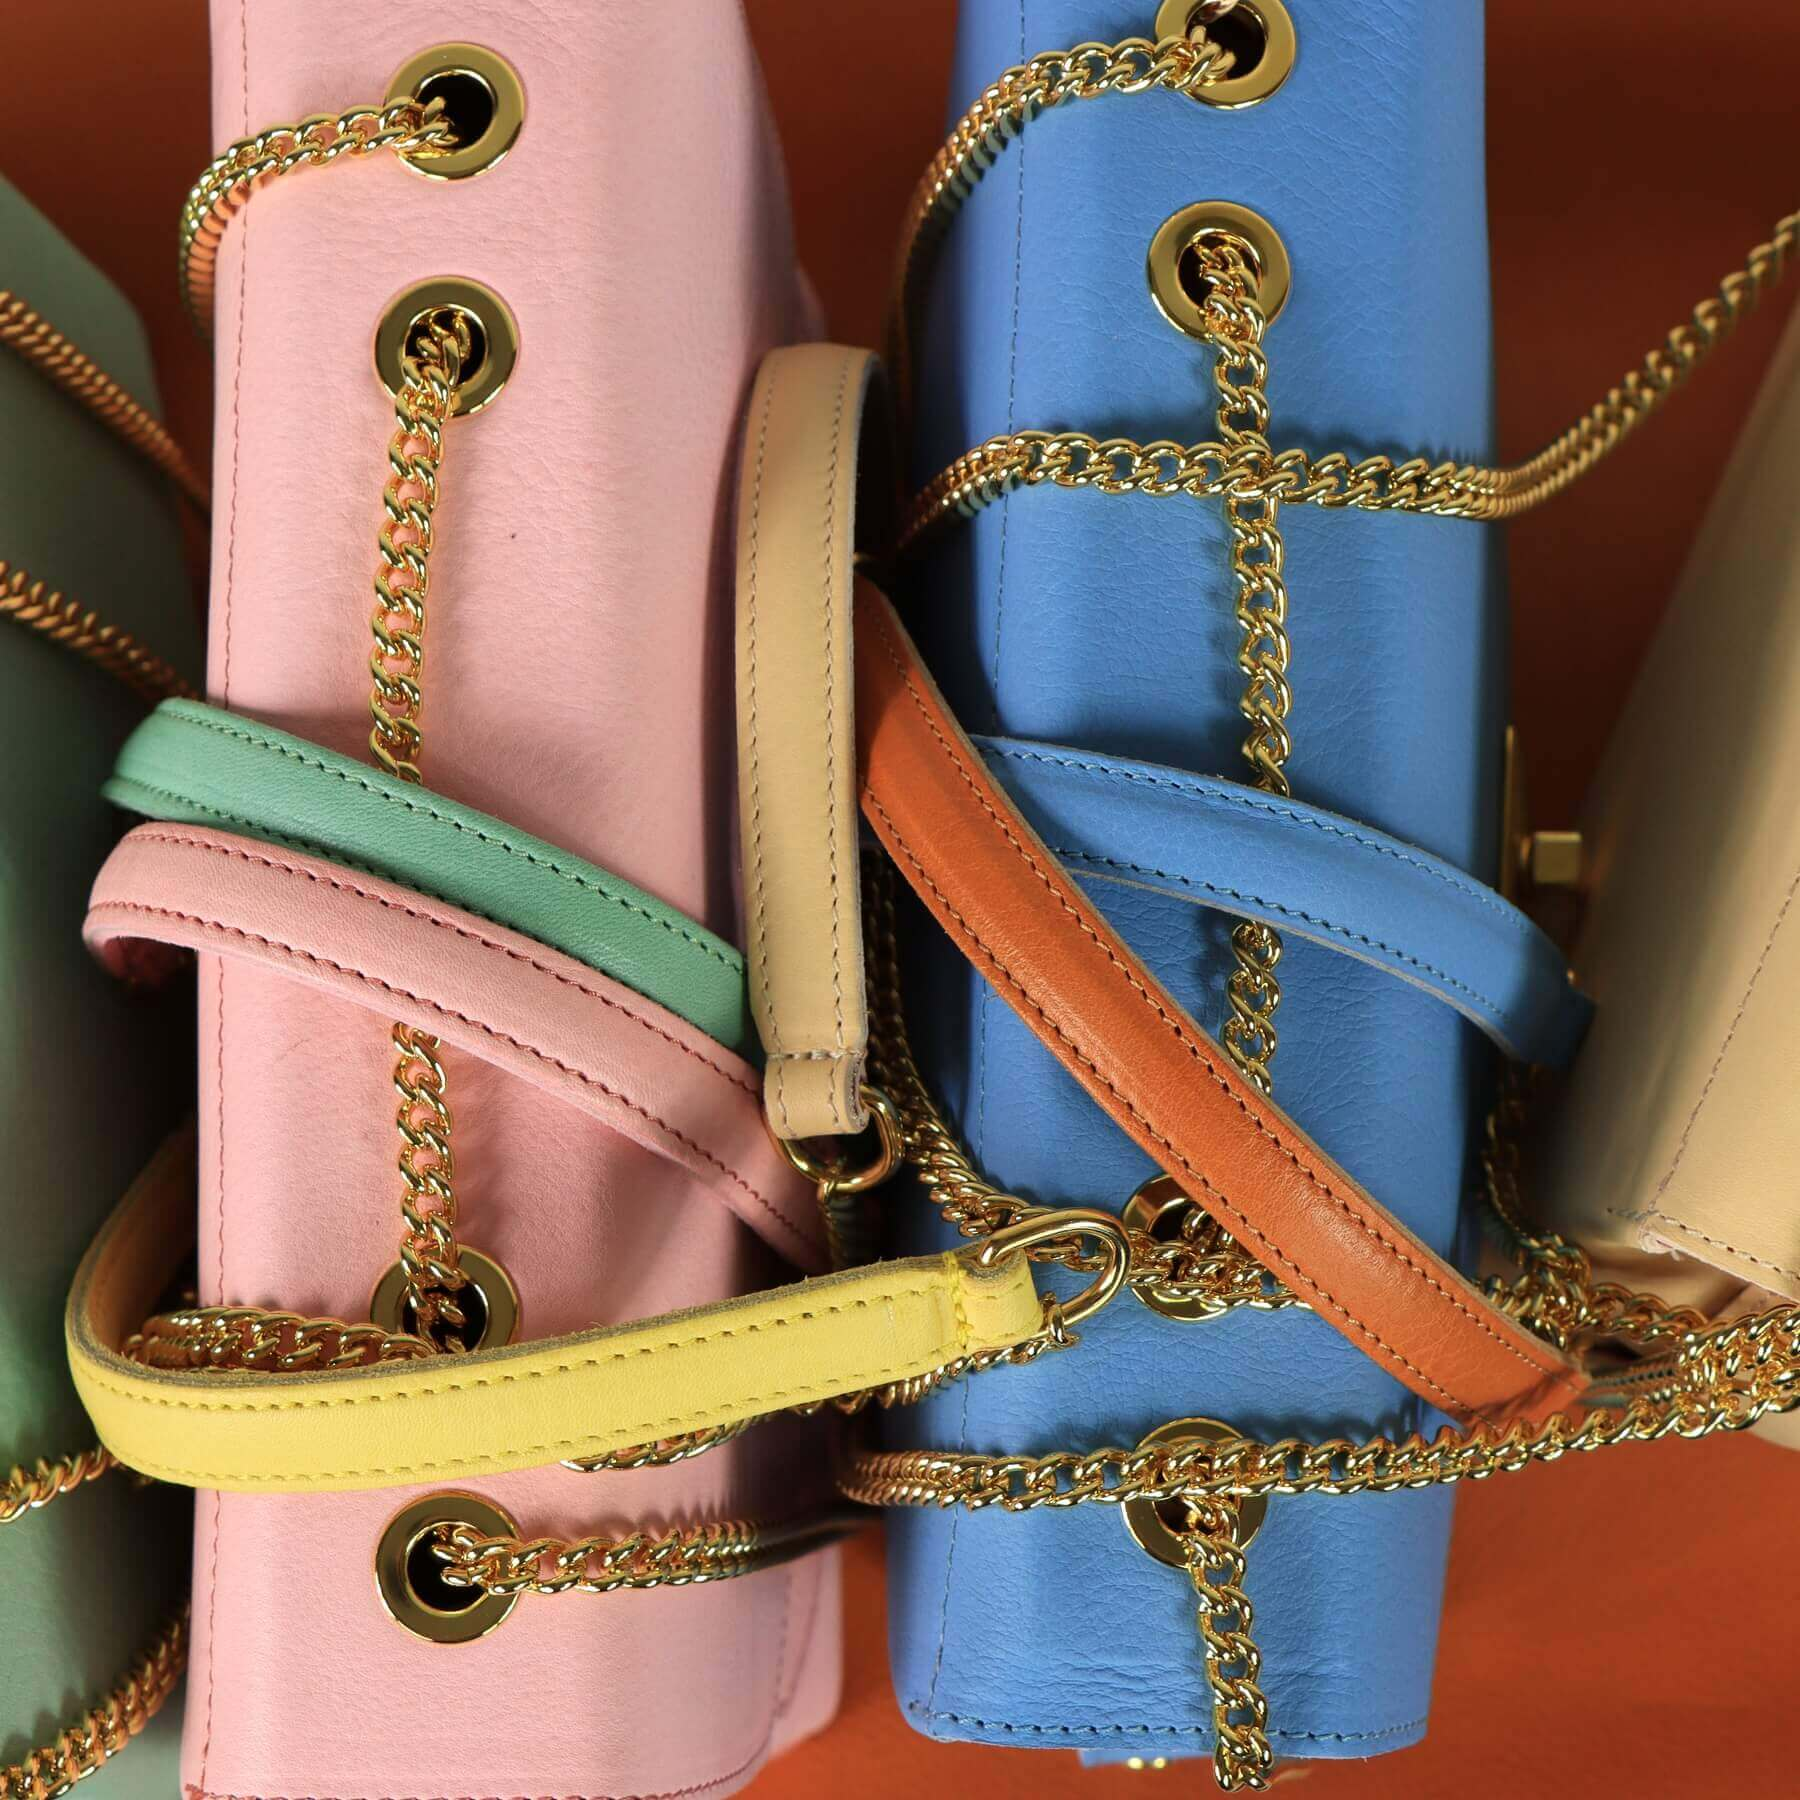 Italian Tradition in Fashion